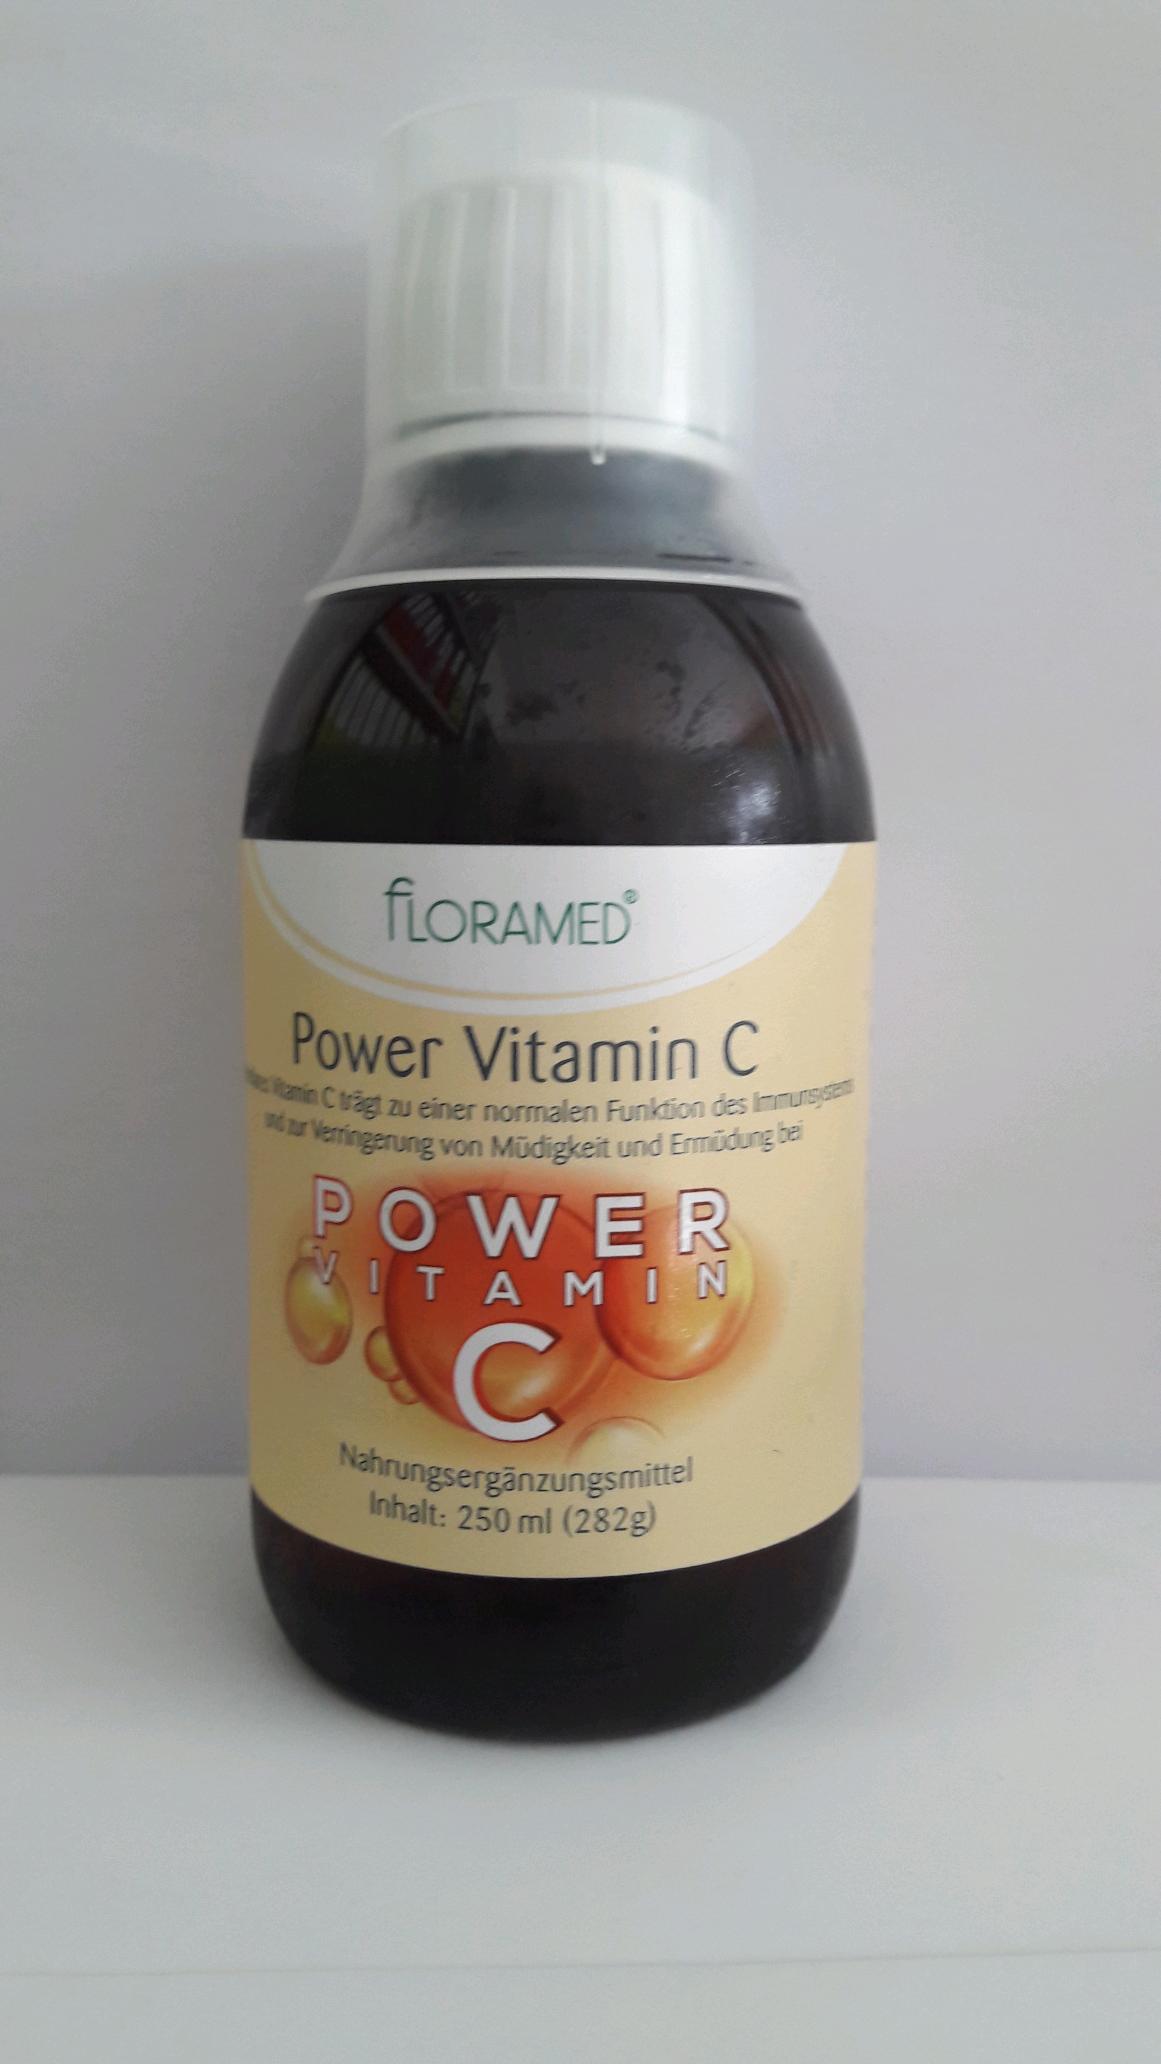 Floramed Vitamin C Power